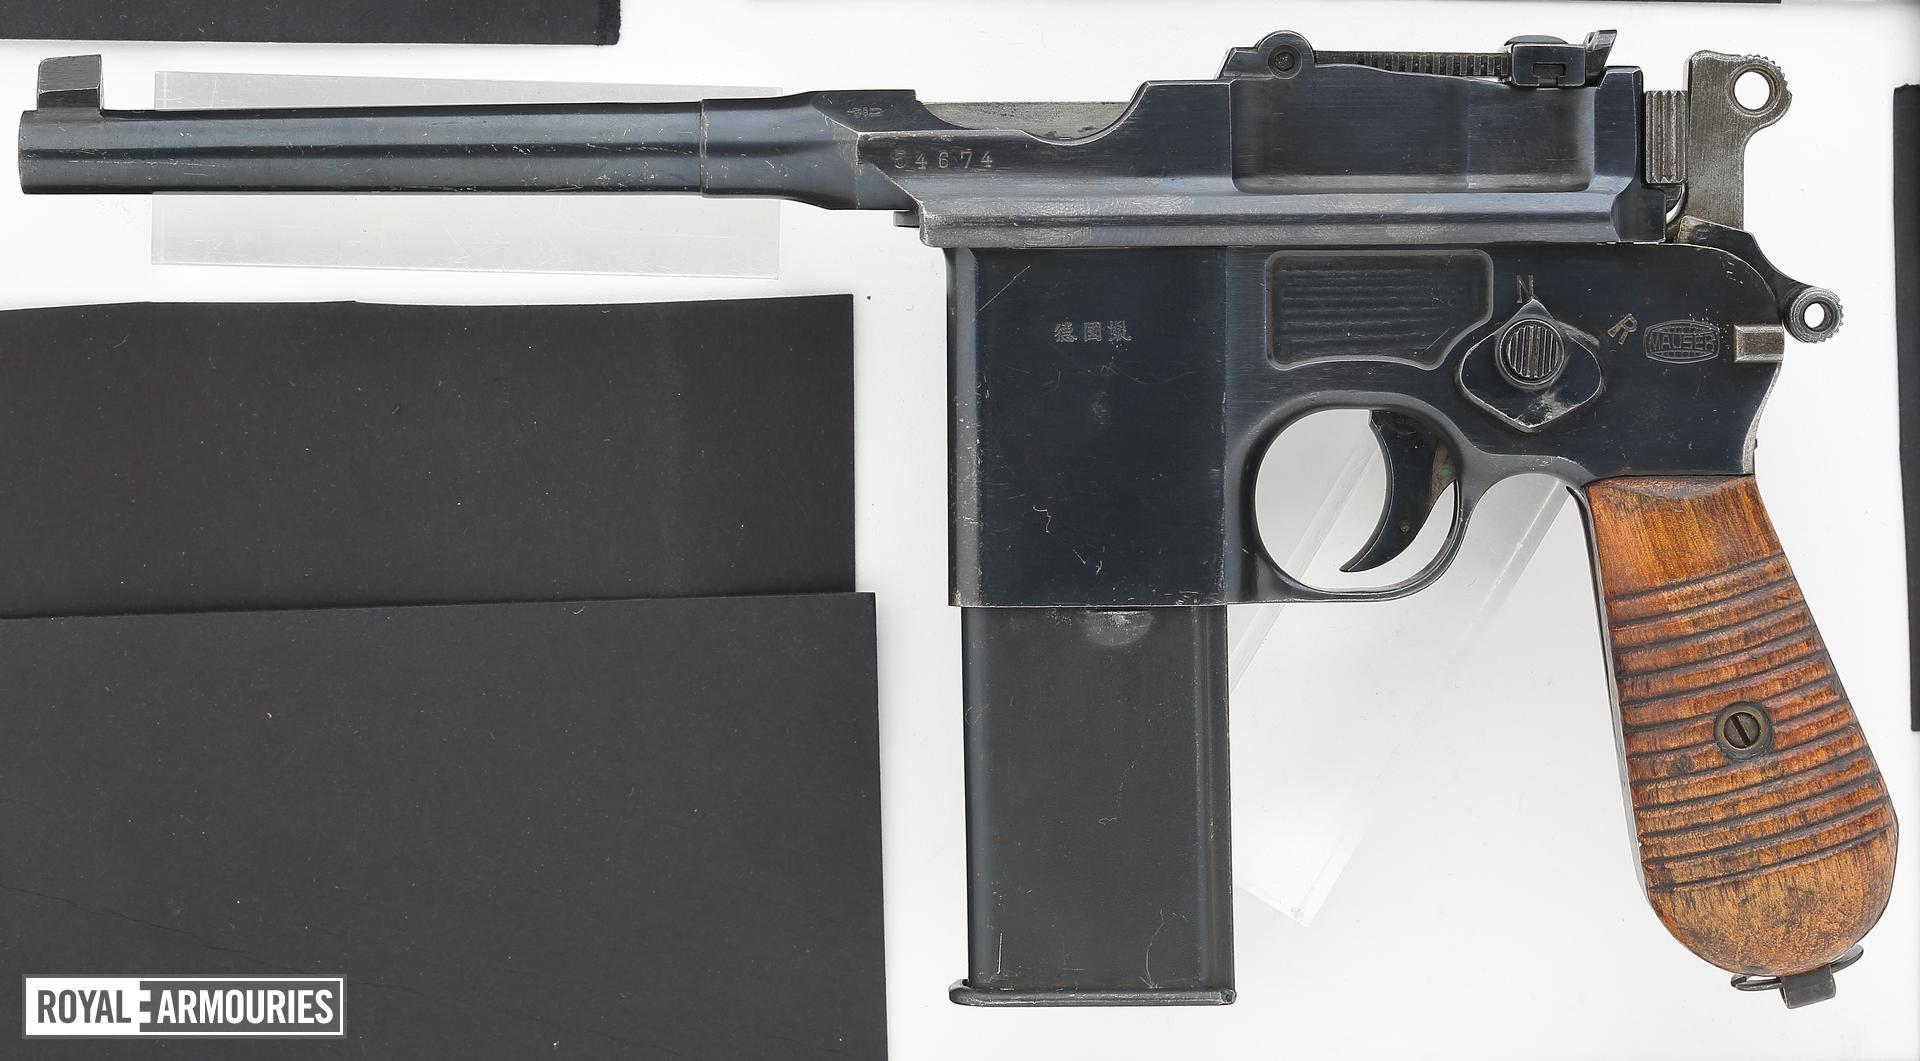 Centrefire automatic pistol - Mauser C96 Model 712